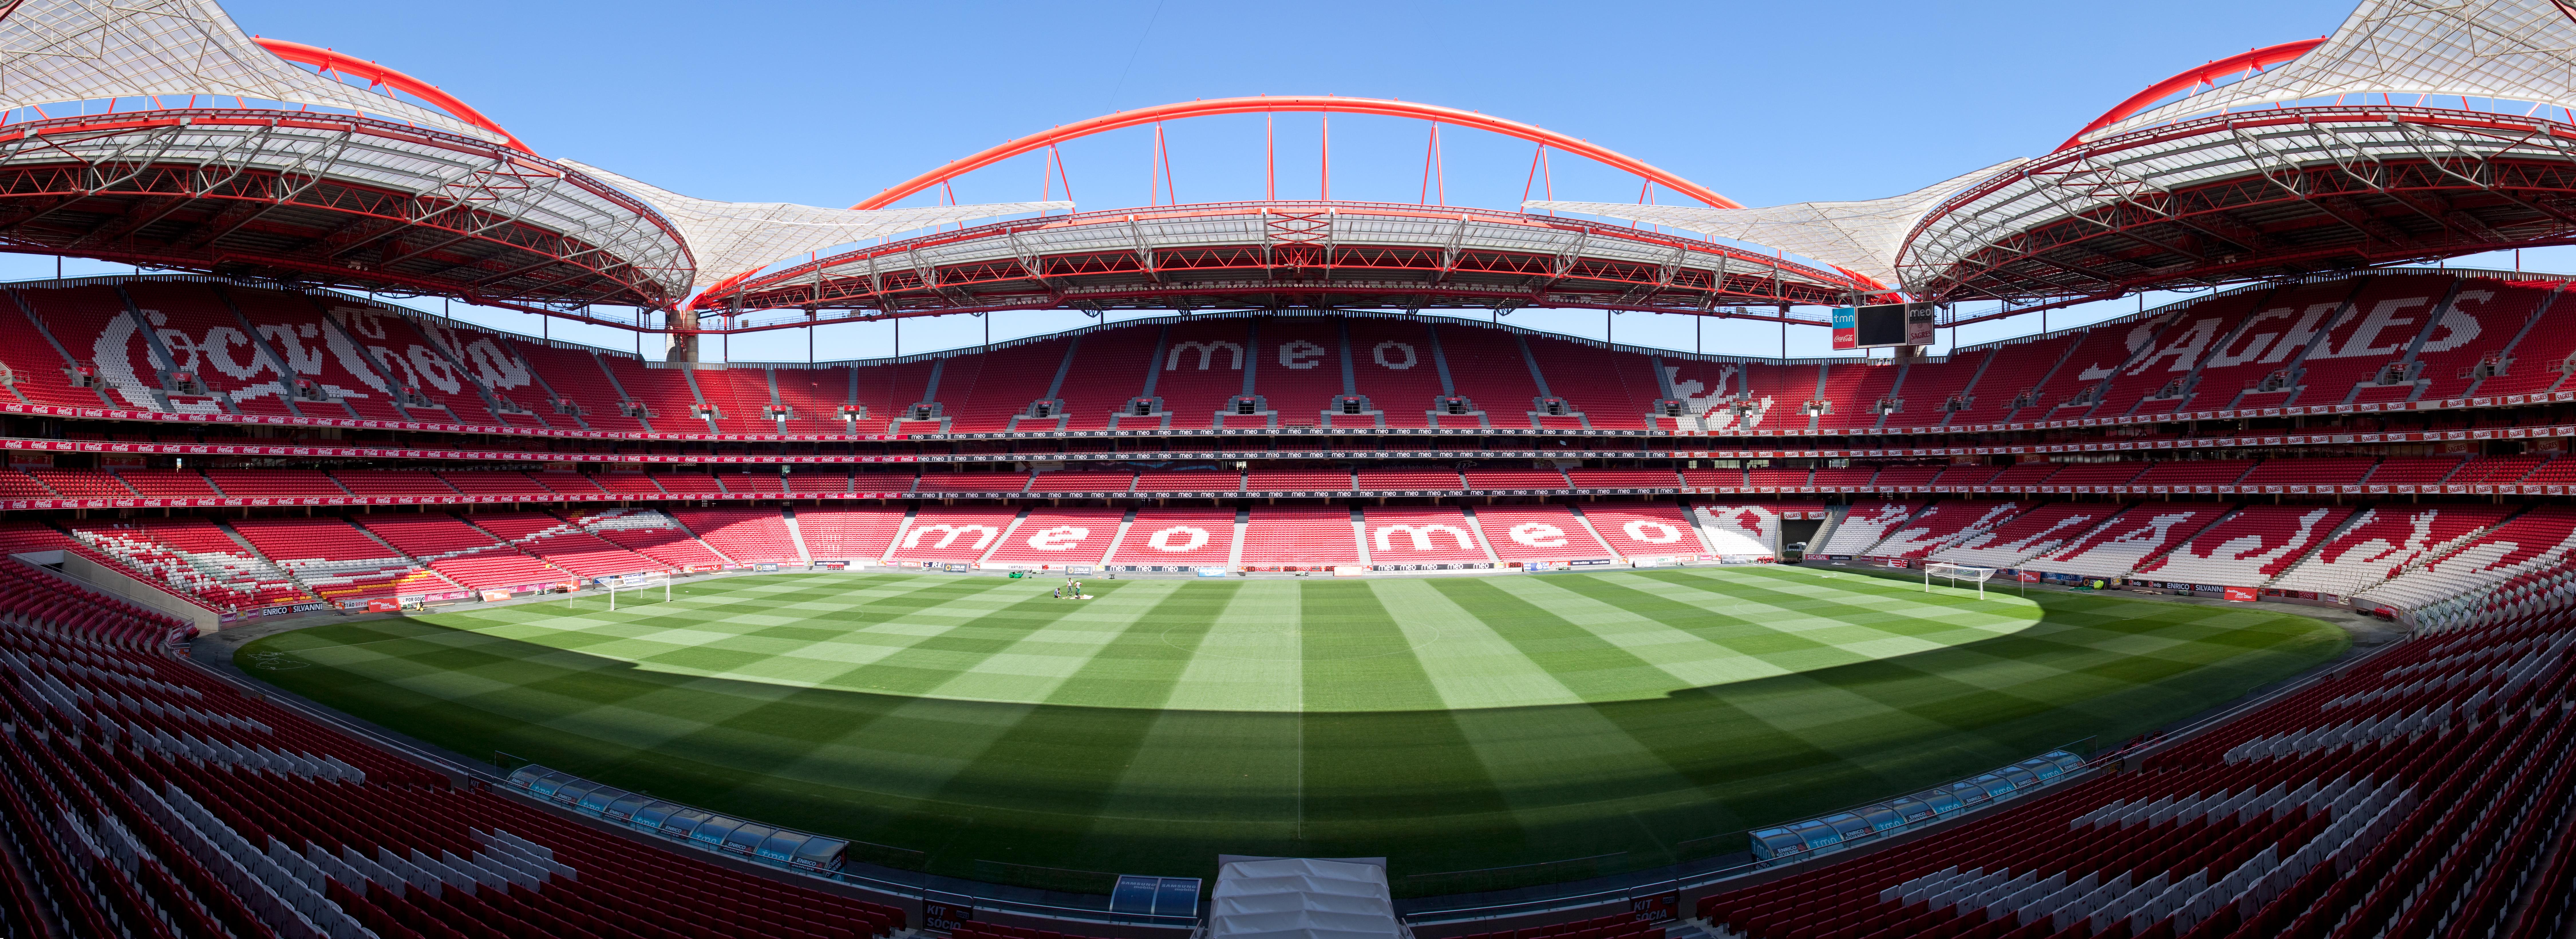 Estádio da Luz entre 73 locais que se podem visitar